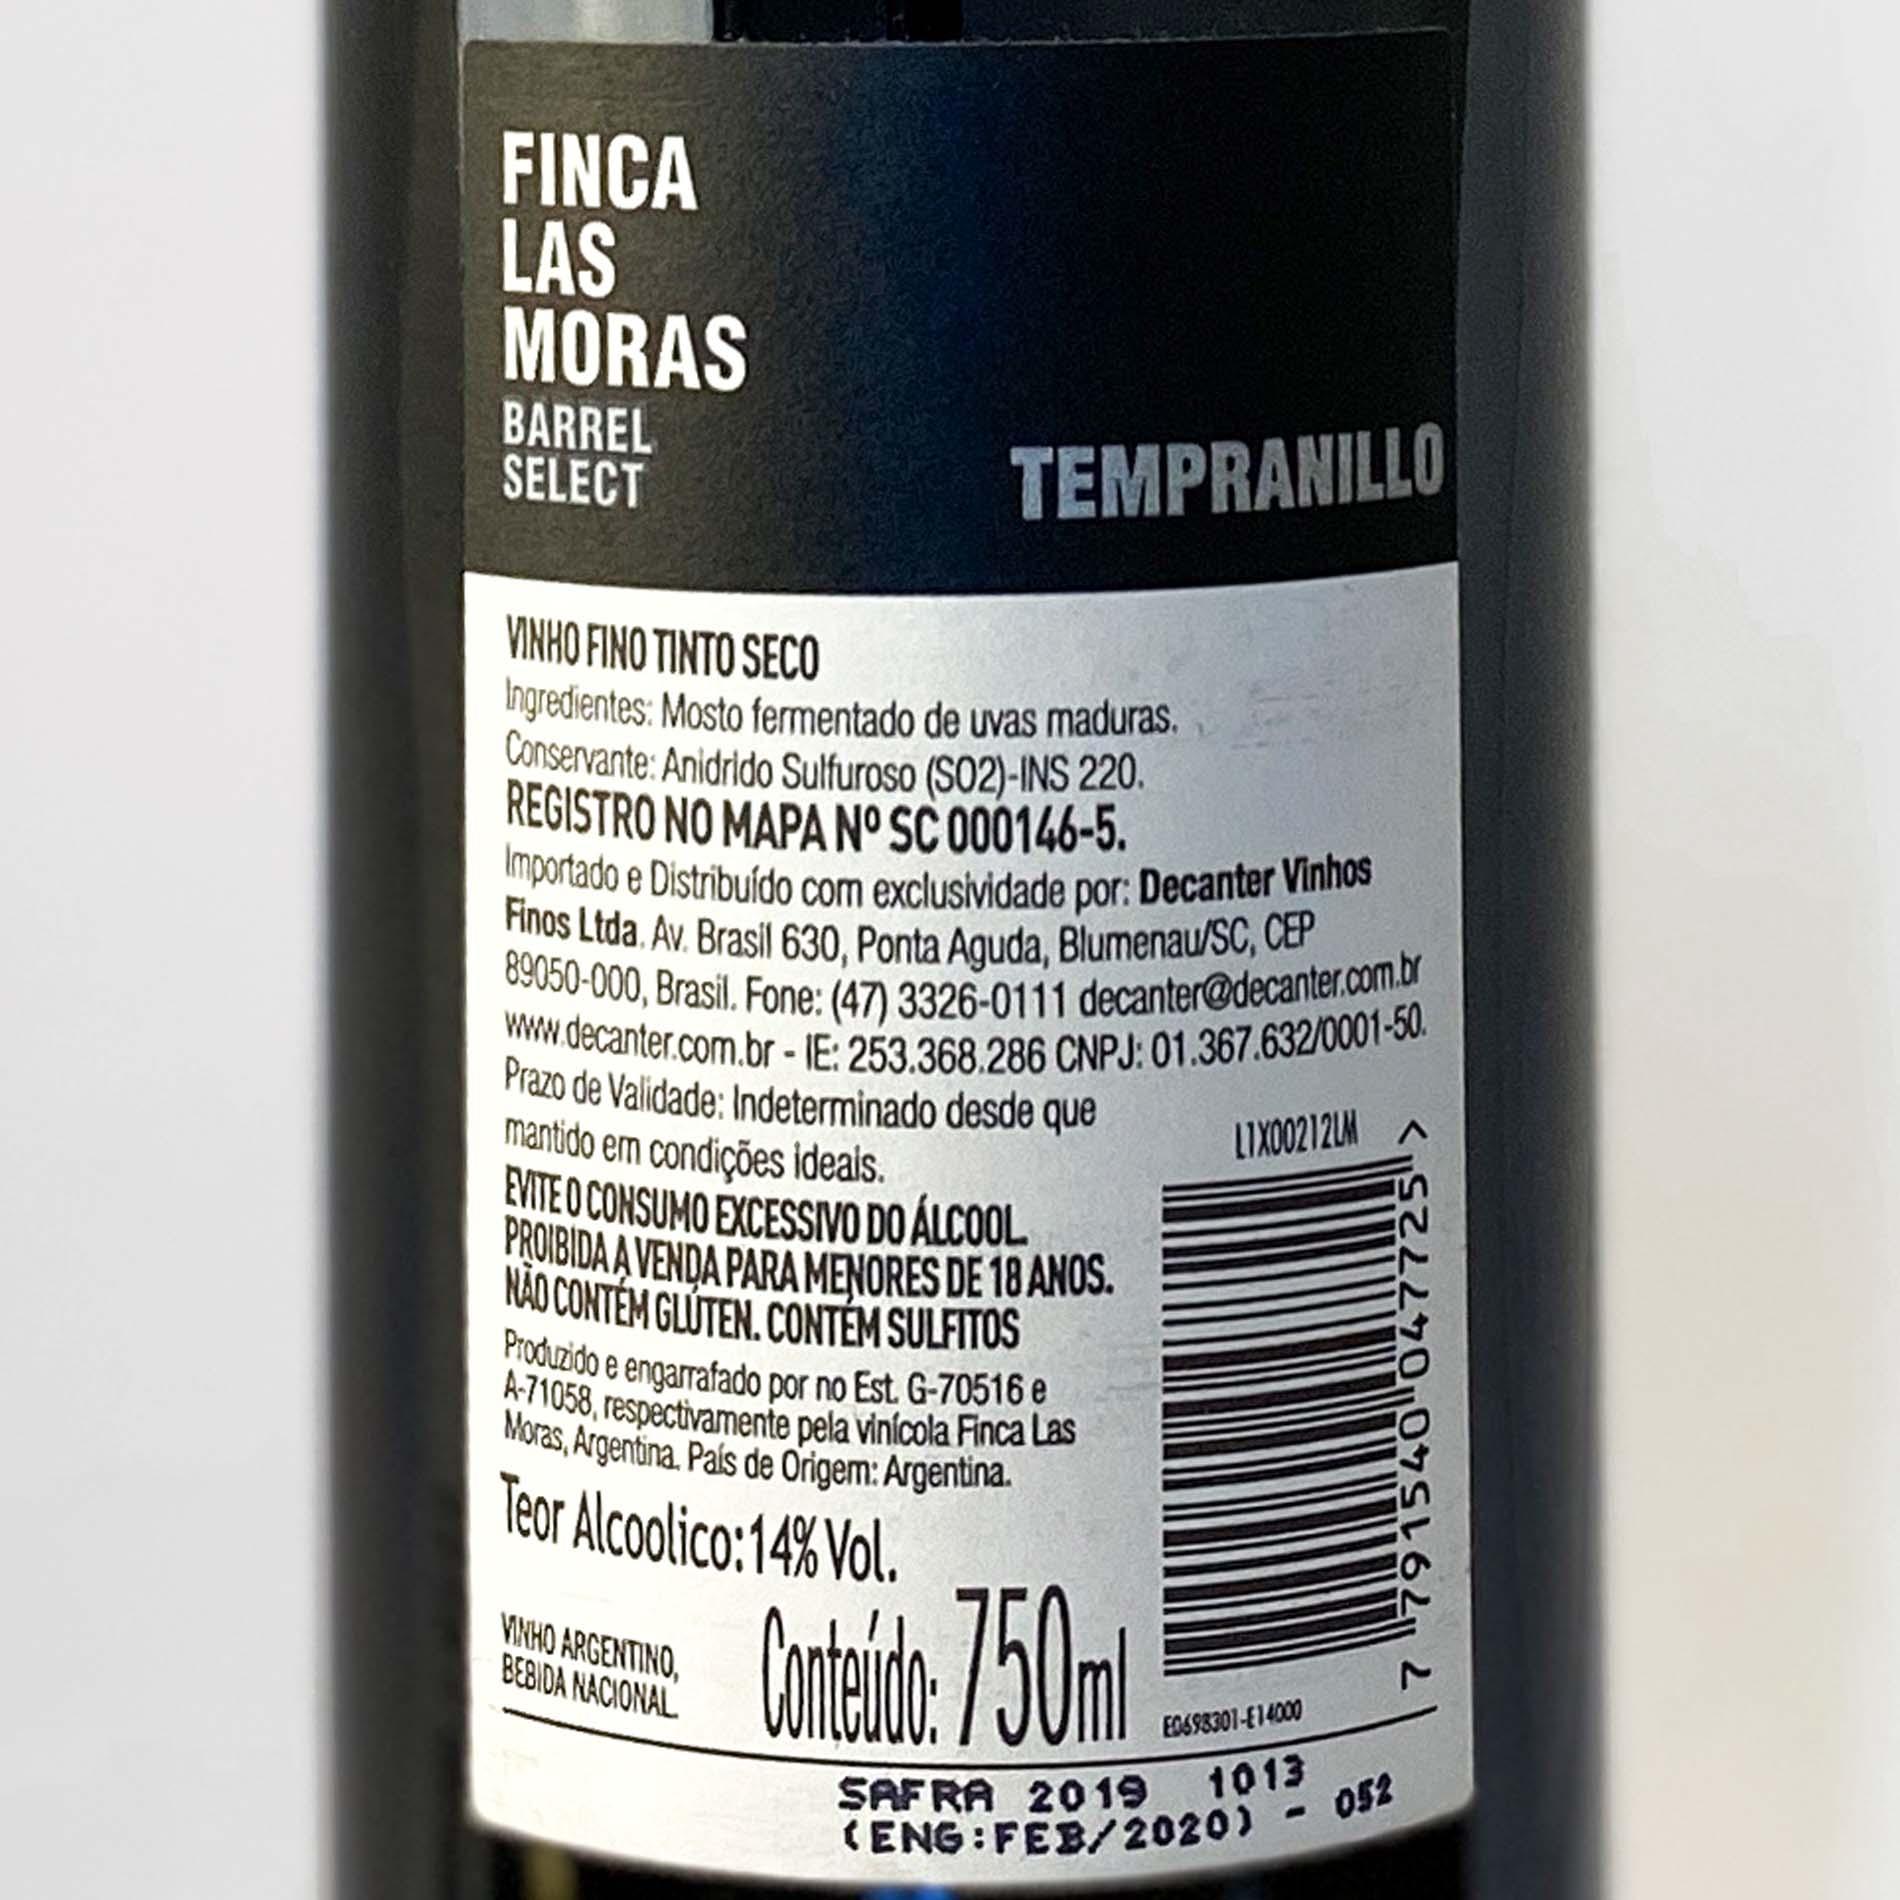 Finca Las Moras Tempranillo Barrel Select  - Vinerize